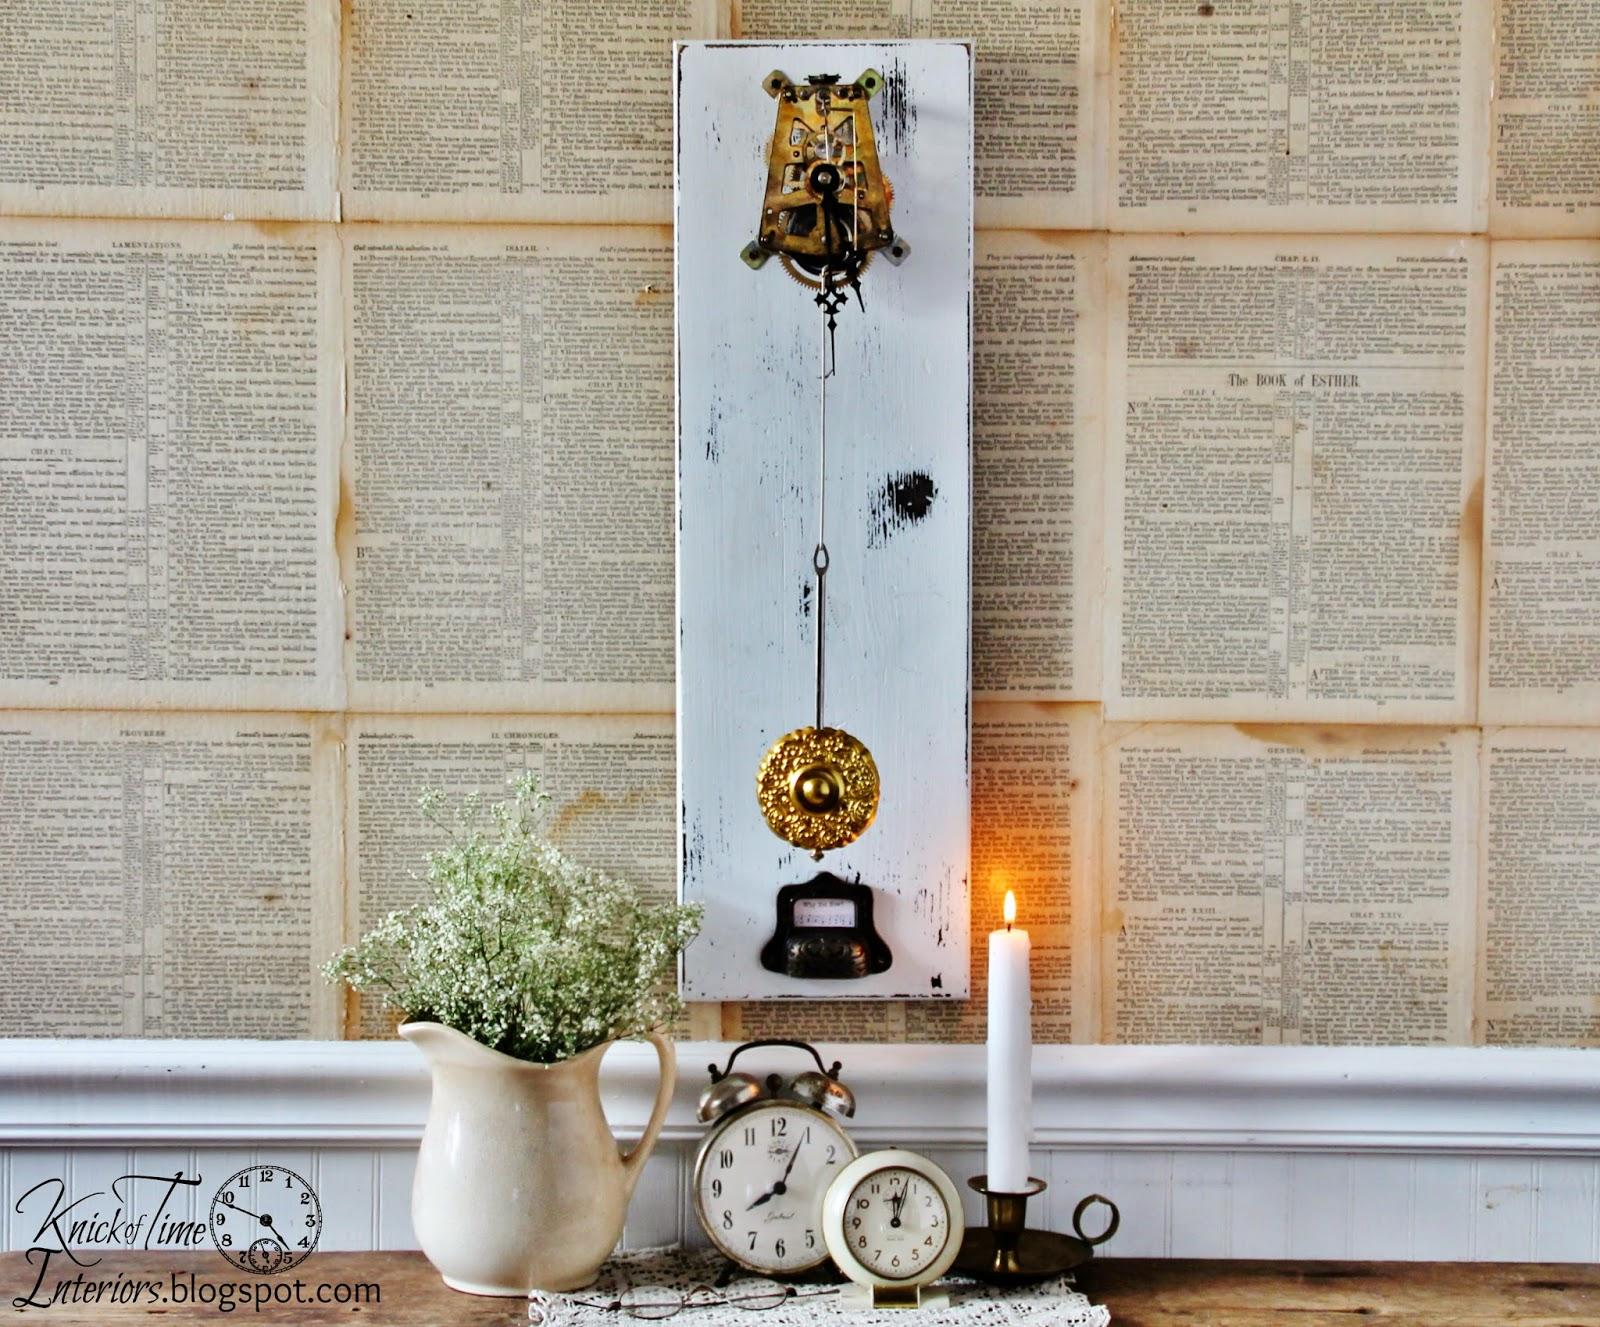 Repurposed Clock Parts Mechanical Gear Train Wall Art via Knick of Time & Repurposed Clock Gears Wall Art | Knick of Time